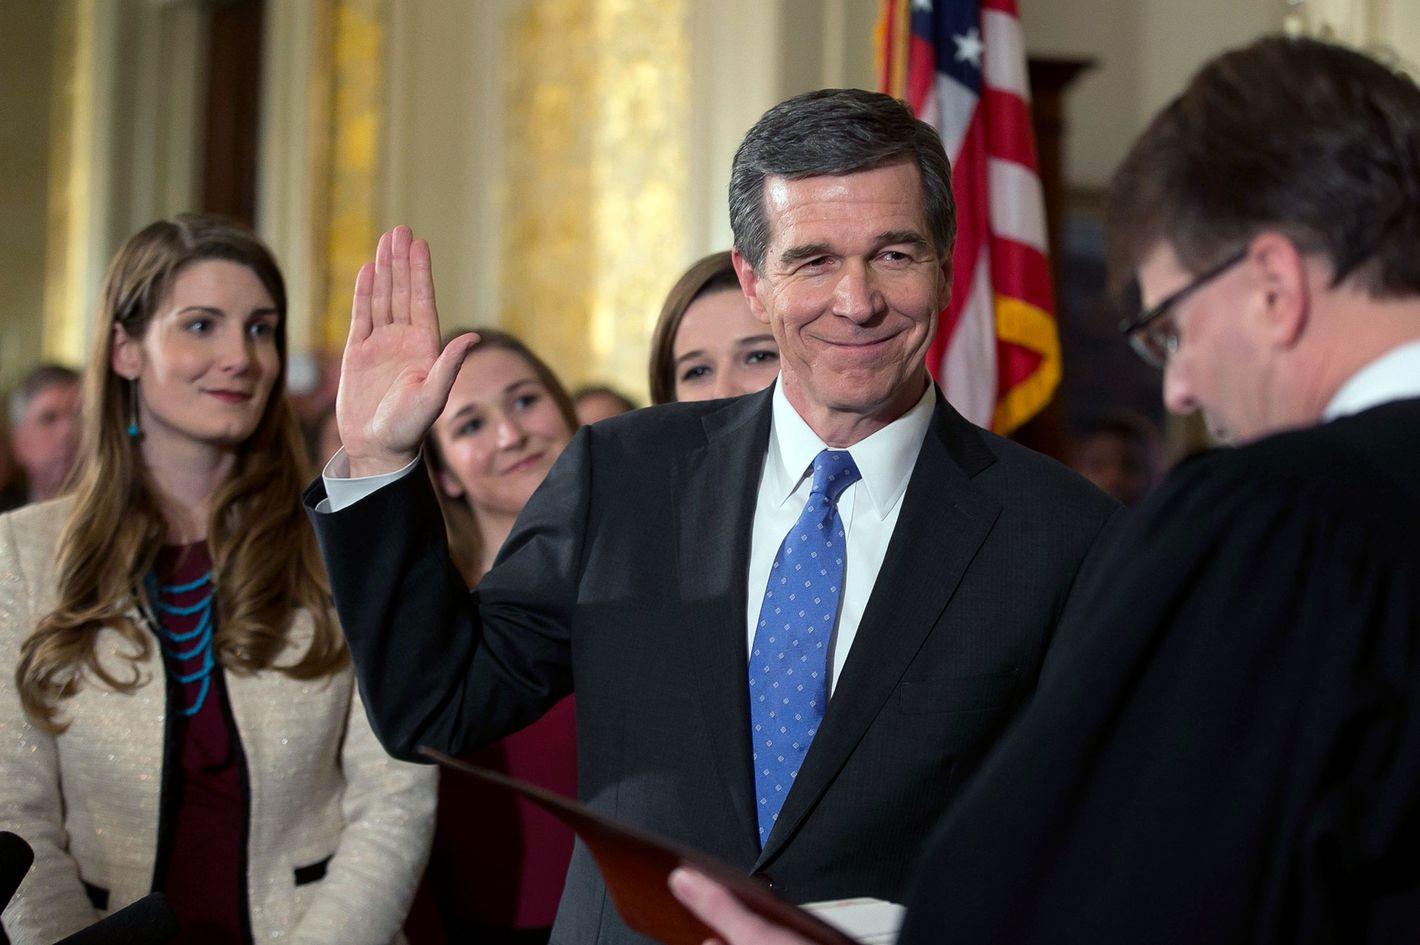 North Carolina Leaders Agree to Repeal Bathroom Bill